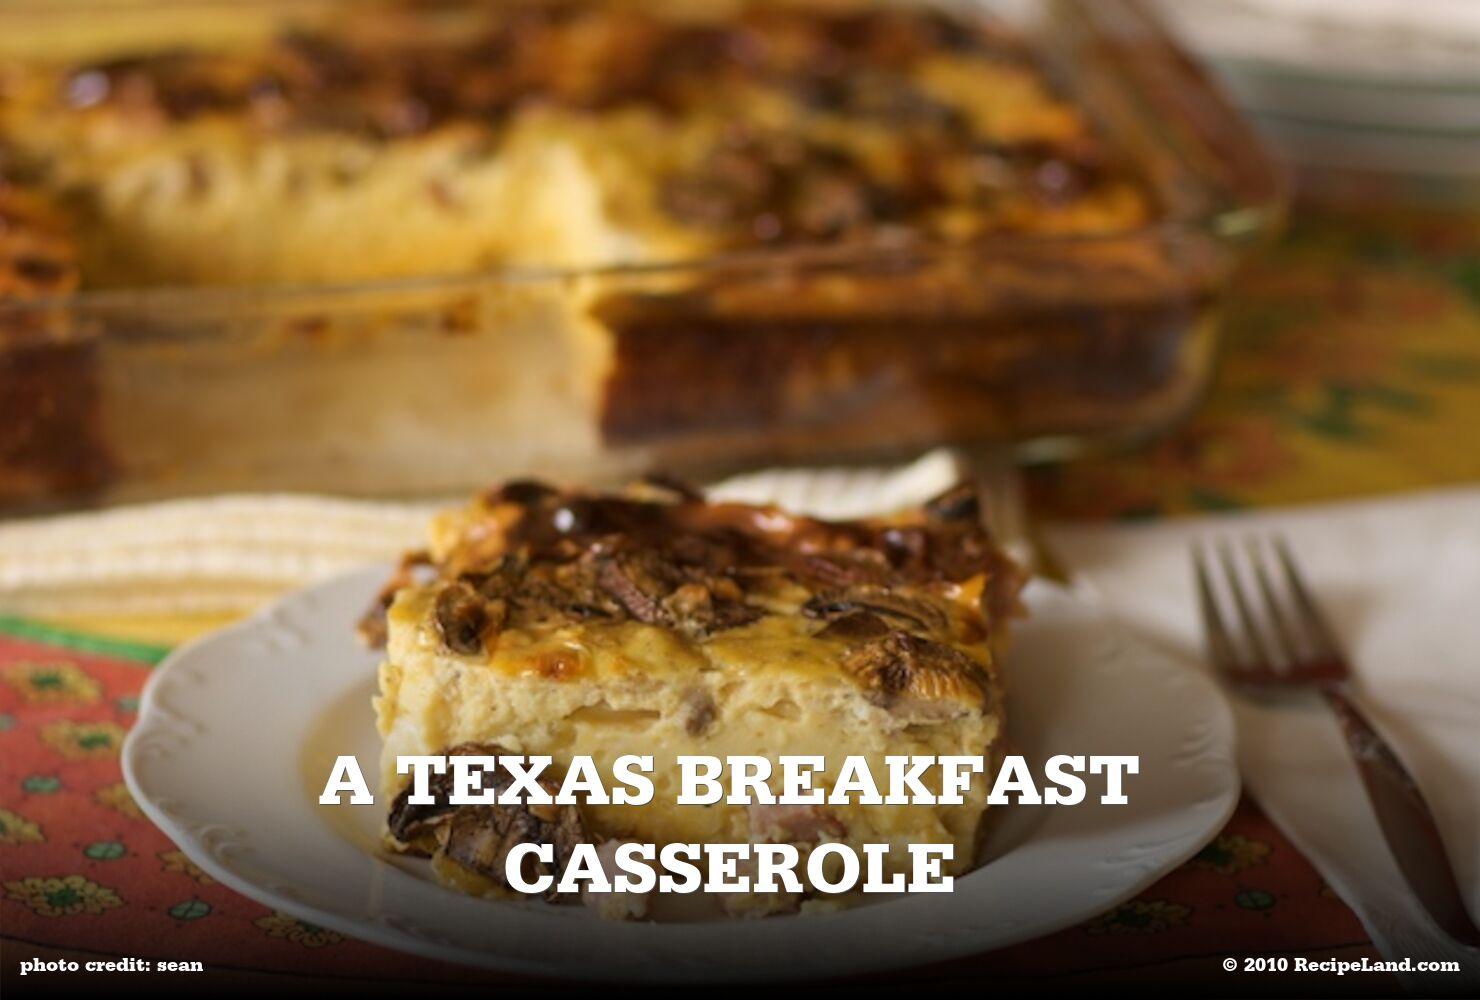 A Texas Breakfast Casserole